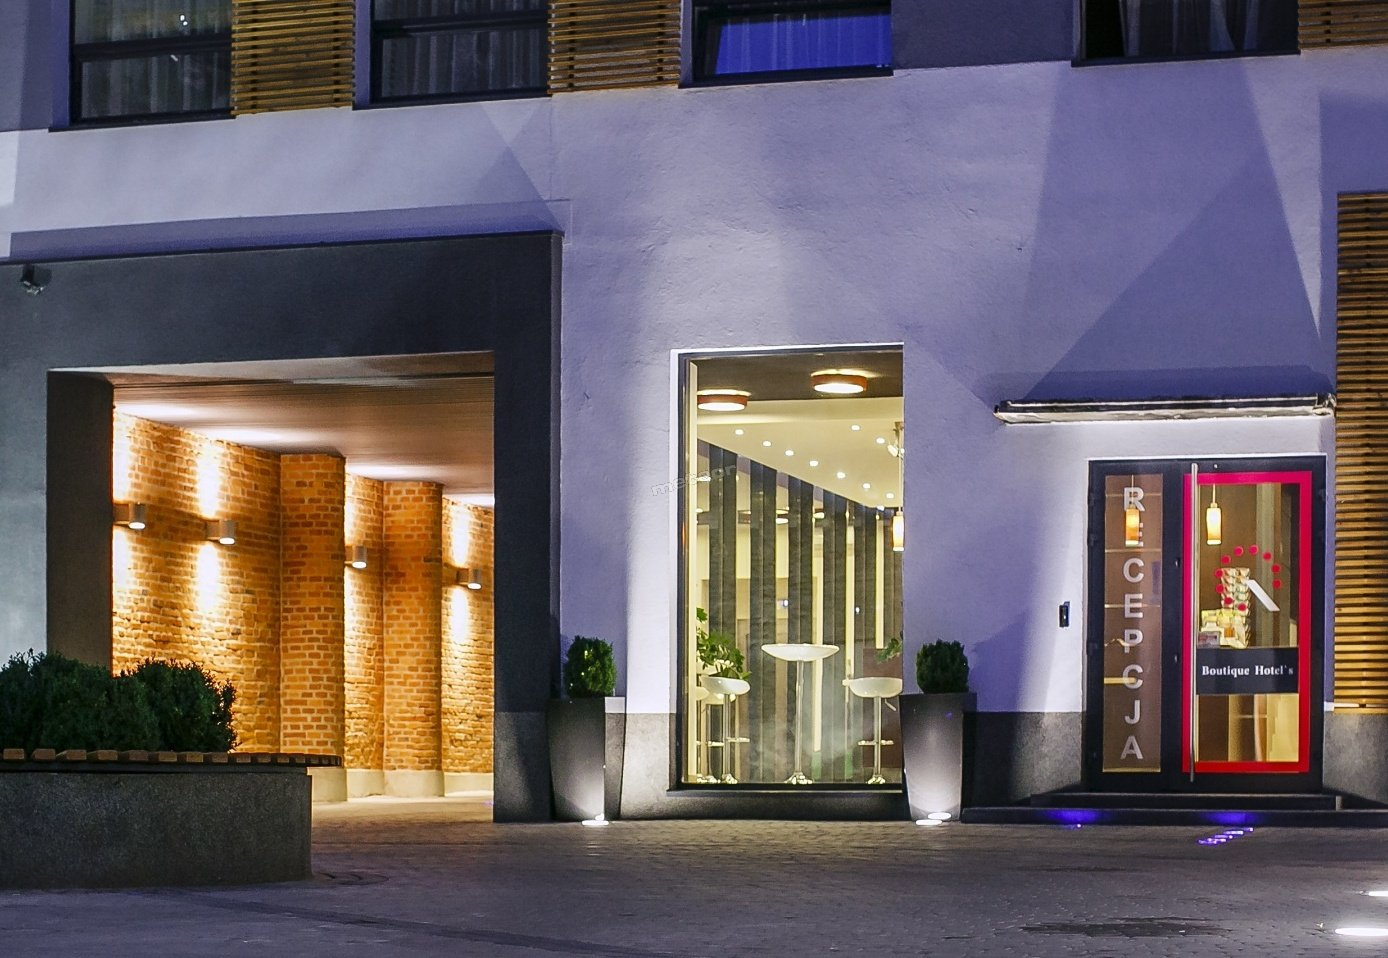 Boutique hotel 39 s ii w odzi for Boutique hotel 1905